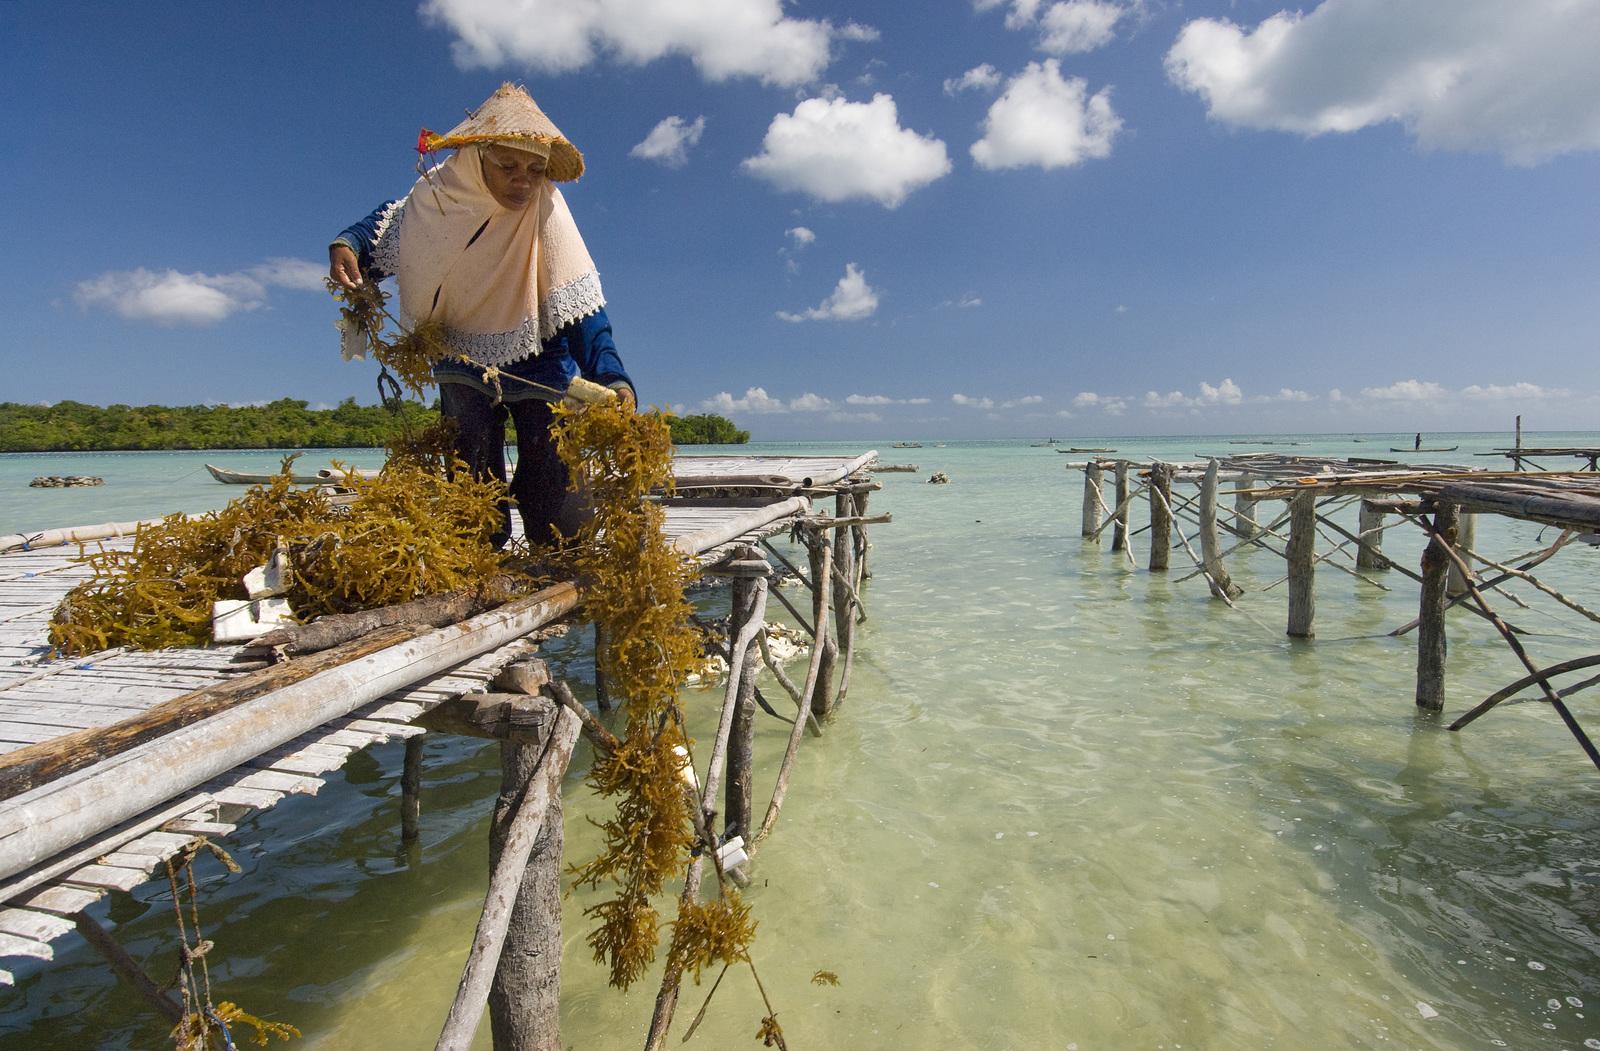 Harvesting seaweed in Liya village on the island of Wangi Wangi in Indonesia. Photo by Bridget Besaw.